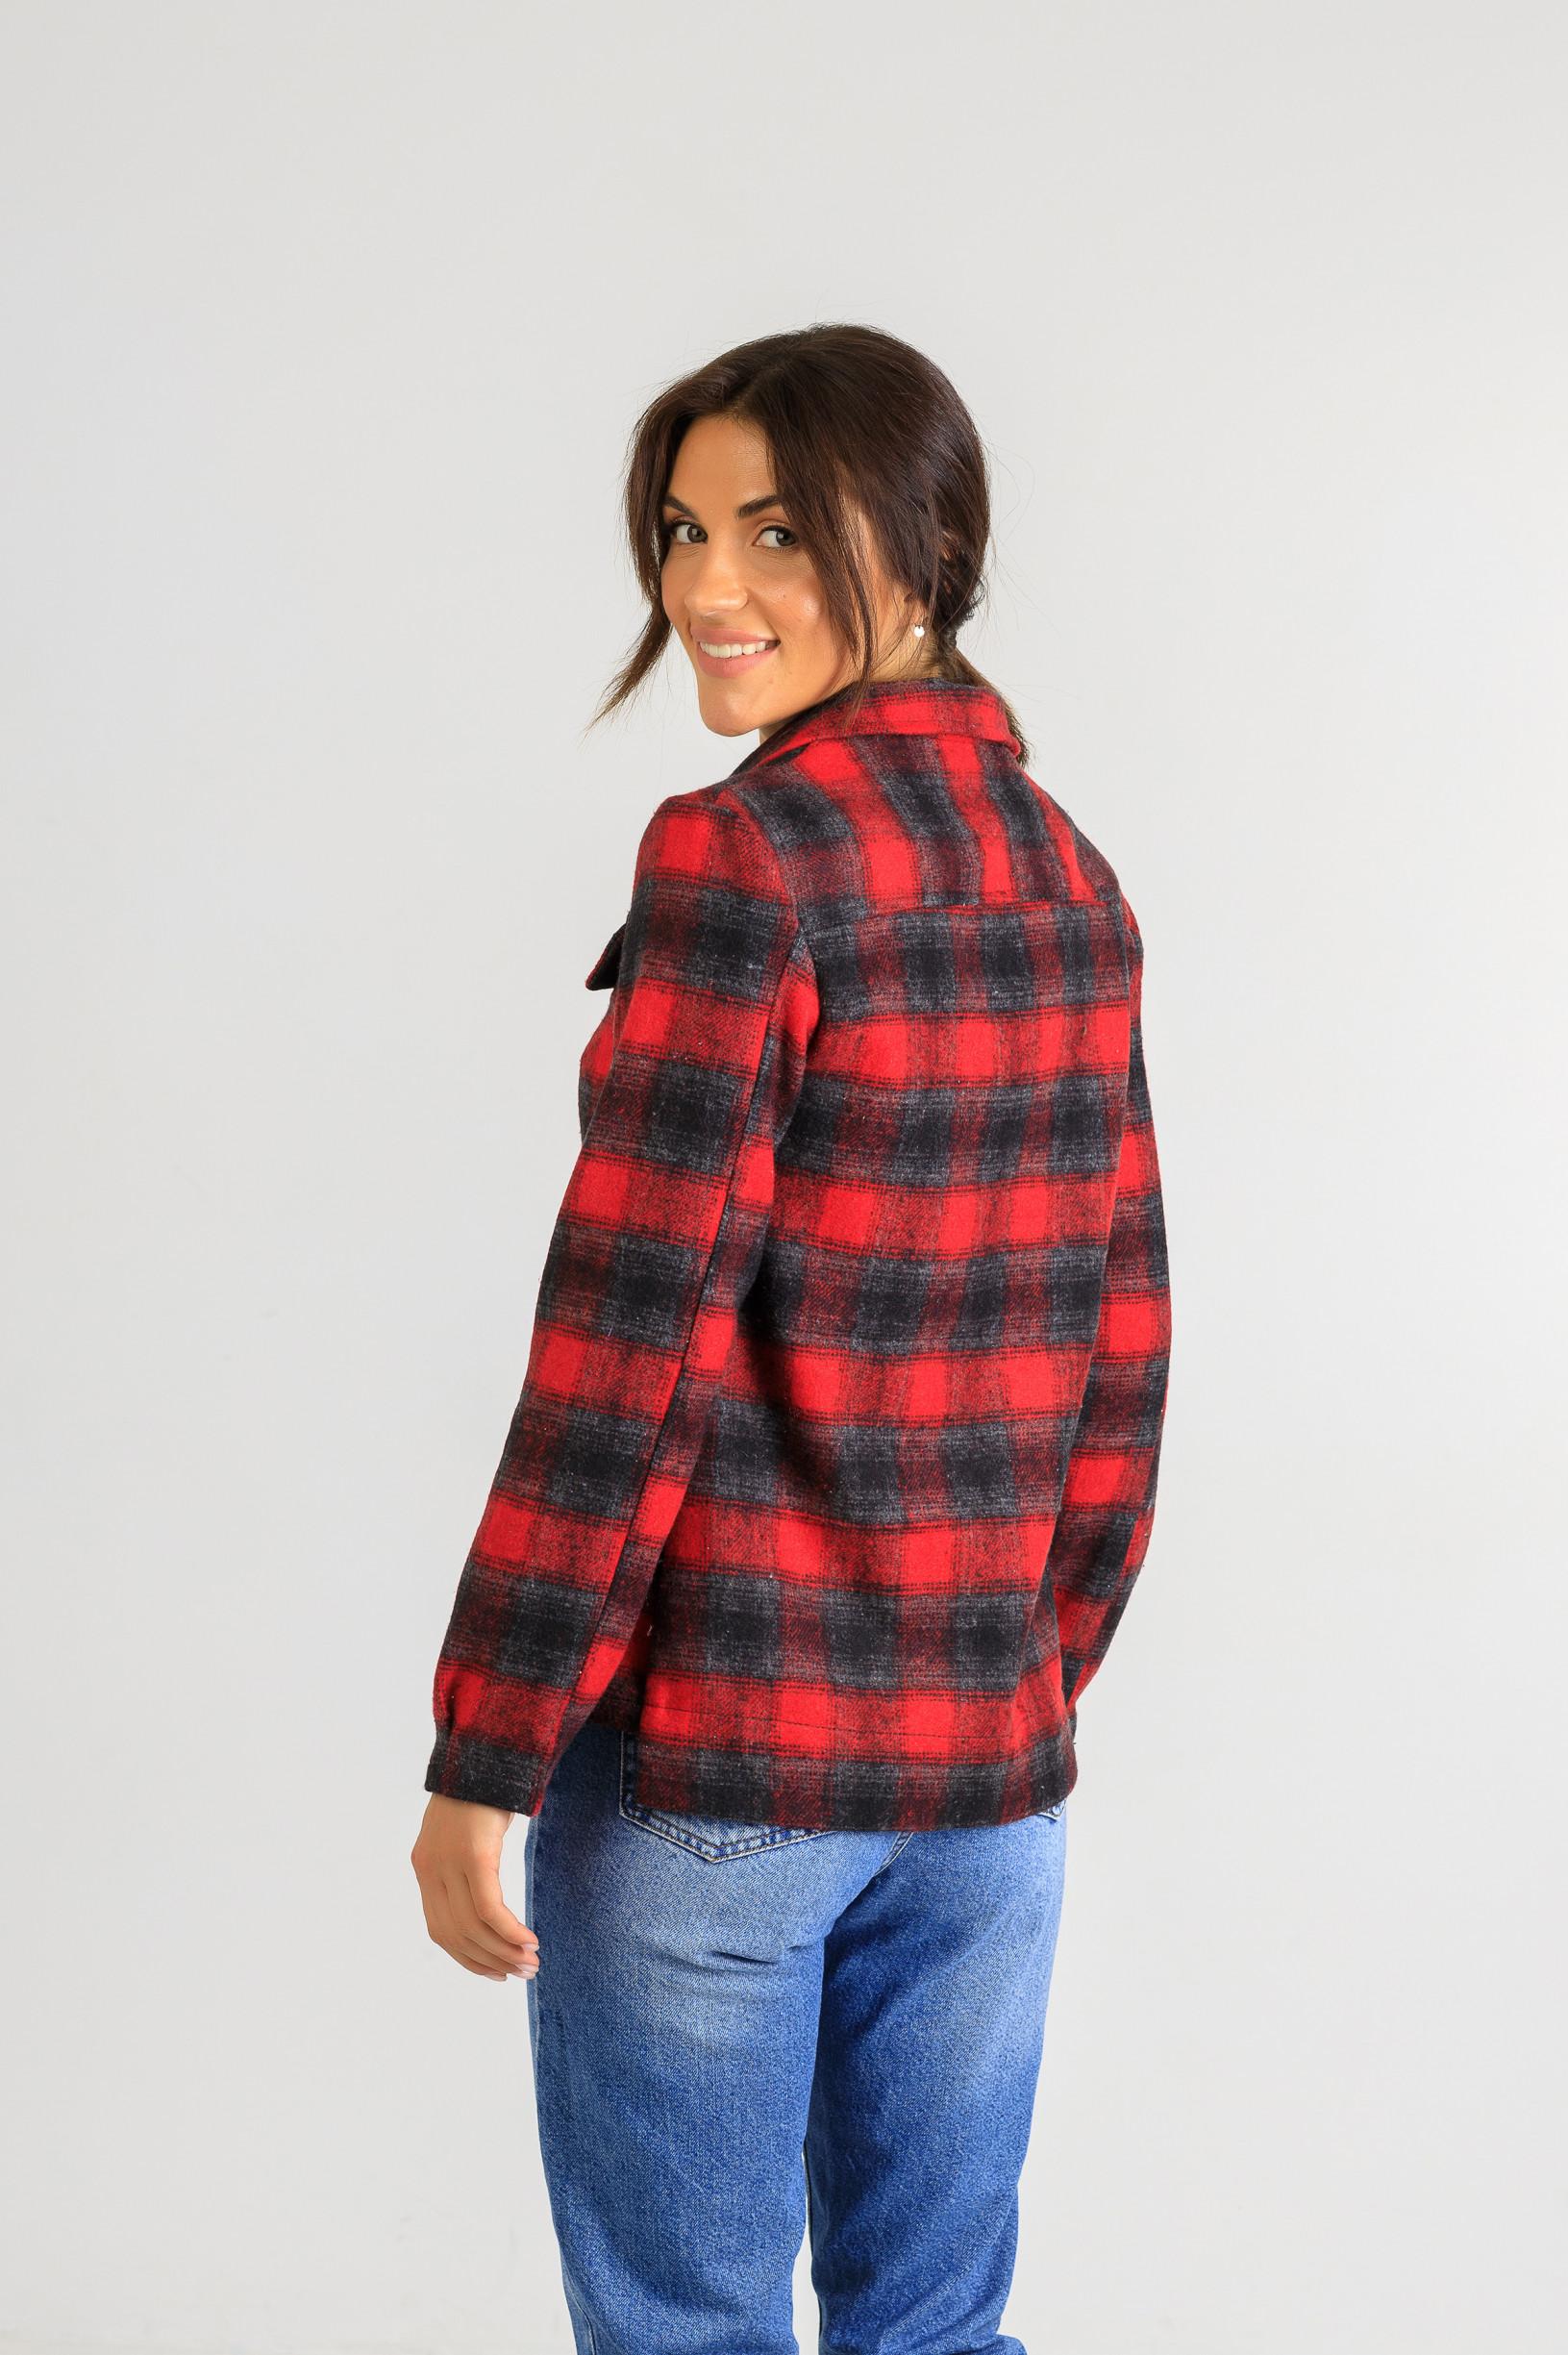 Весенняя рубашка-кардиган р 875 красная